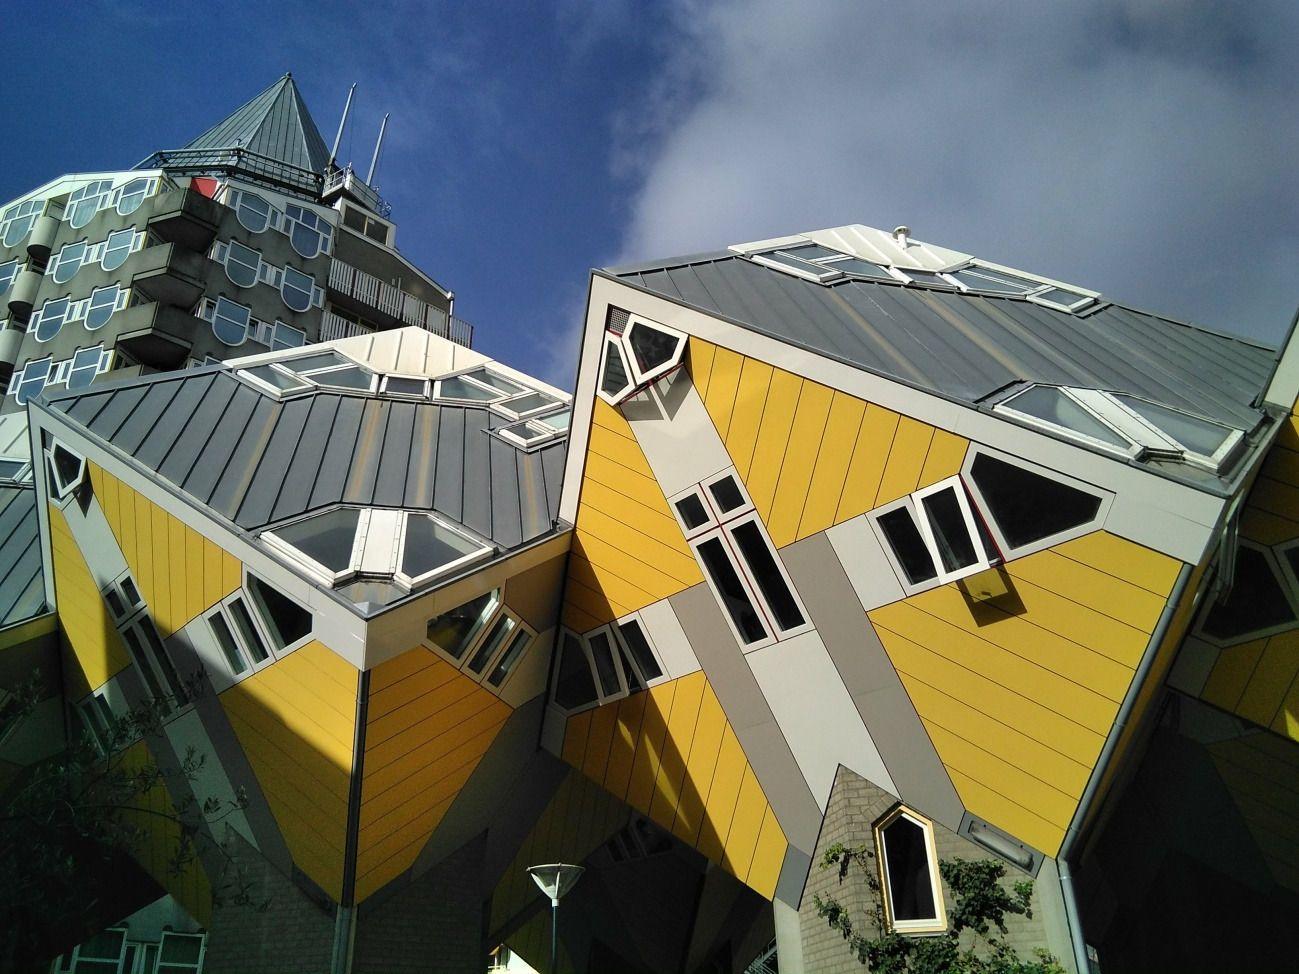 THE ROTTERDAM ARCHITECTURE : STILL SURPRISING